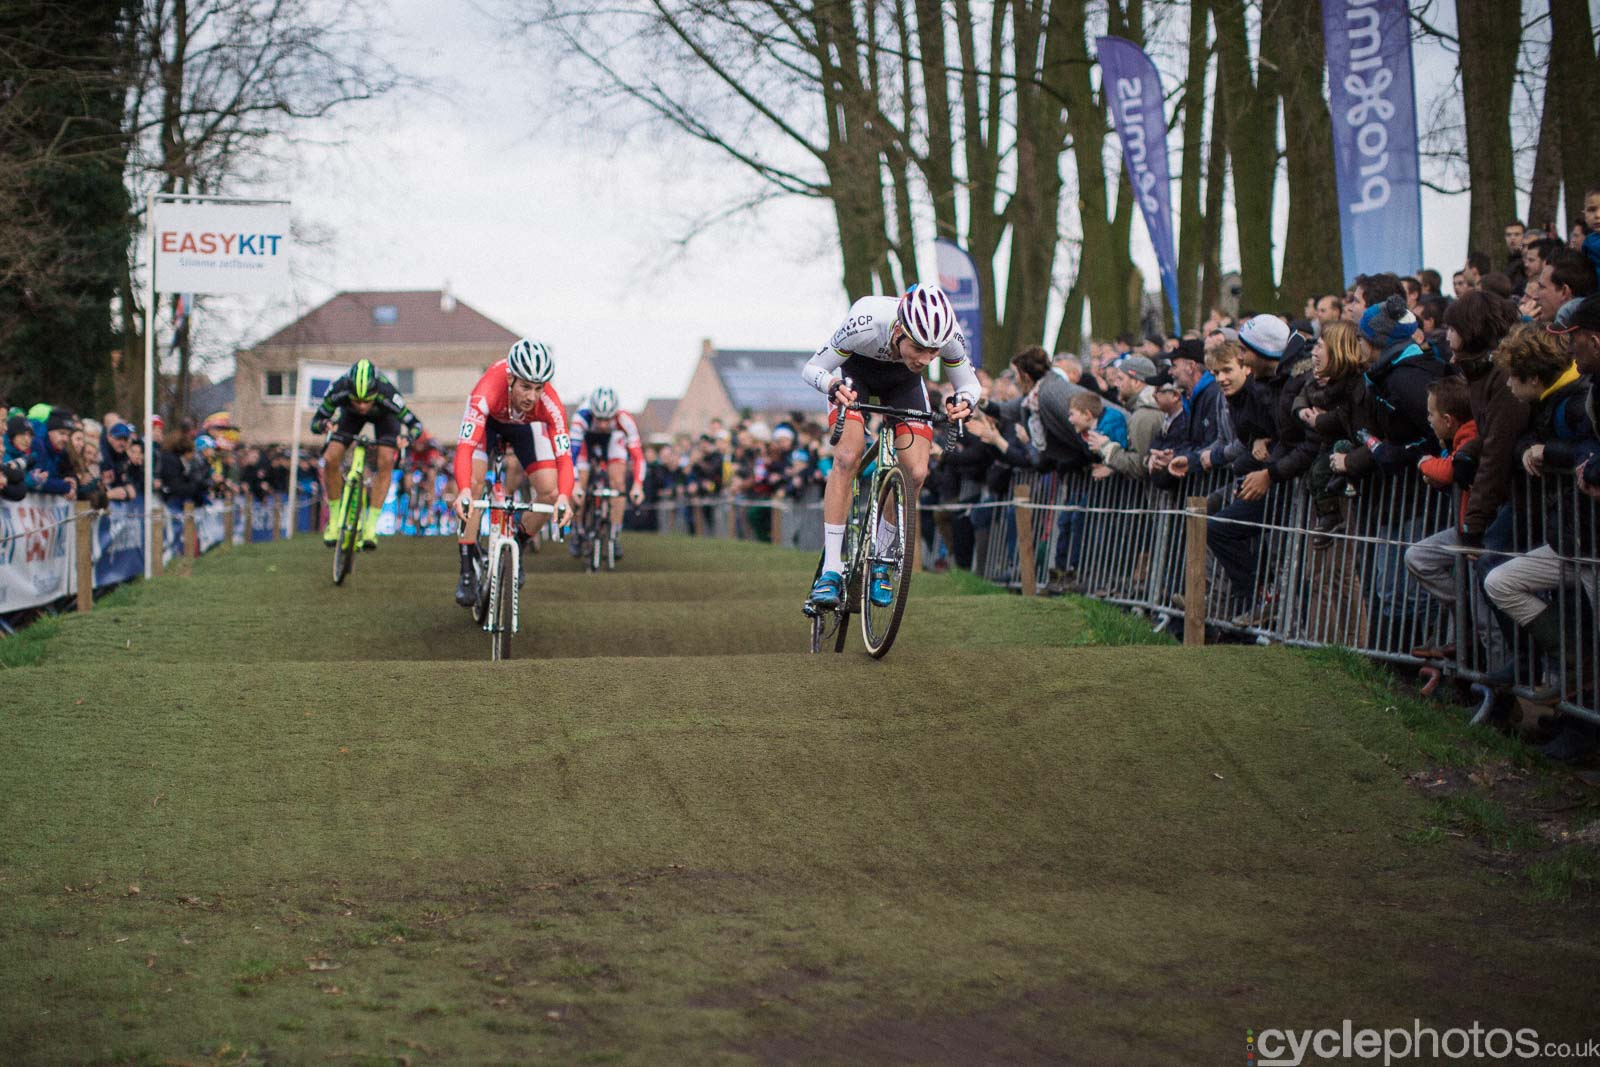 2015-cyclephotos-cyclocross-azencross-152451-mathieu-van-der-poel